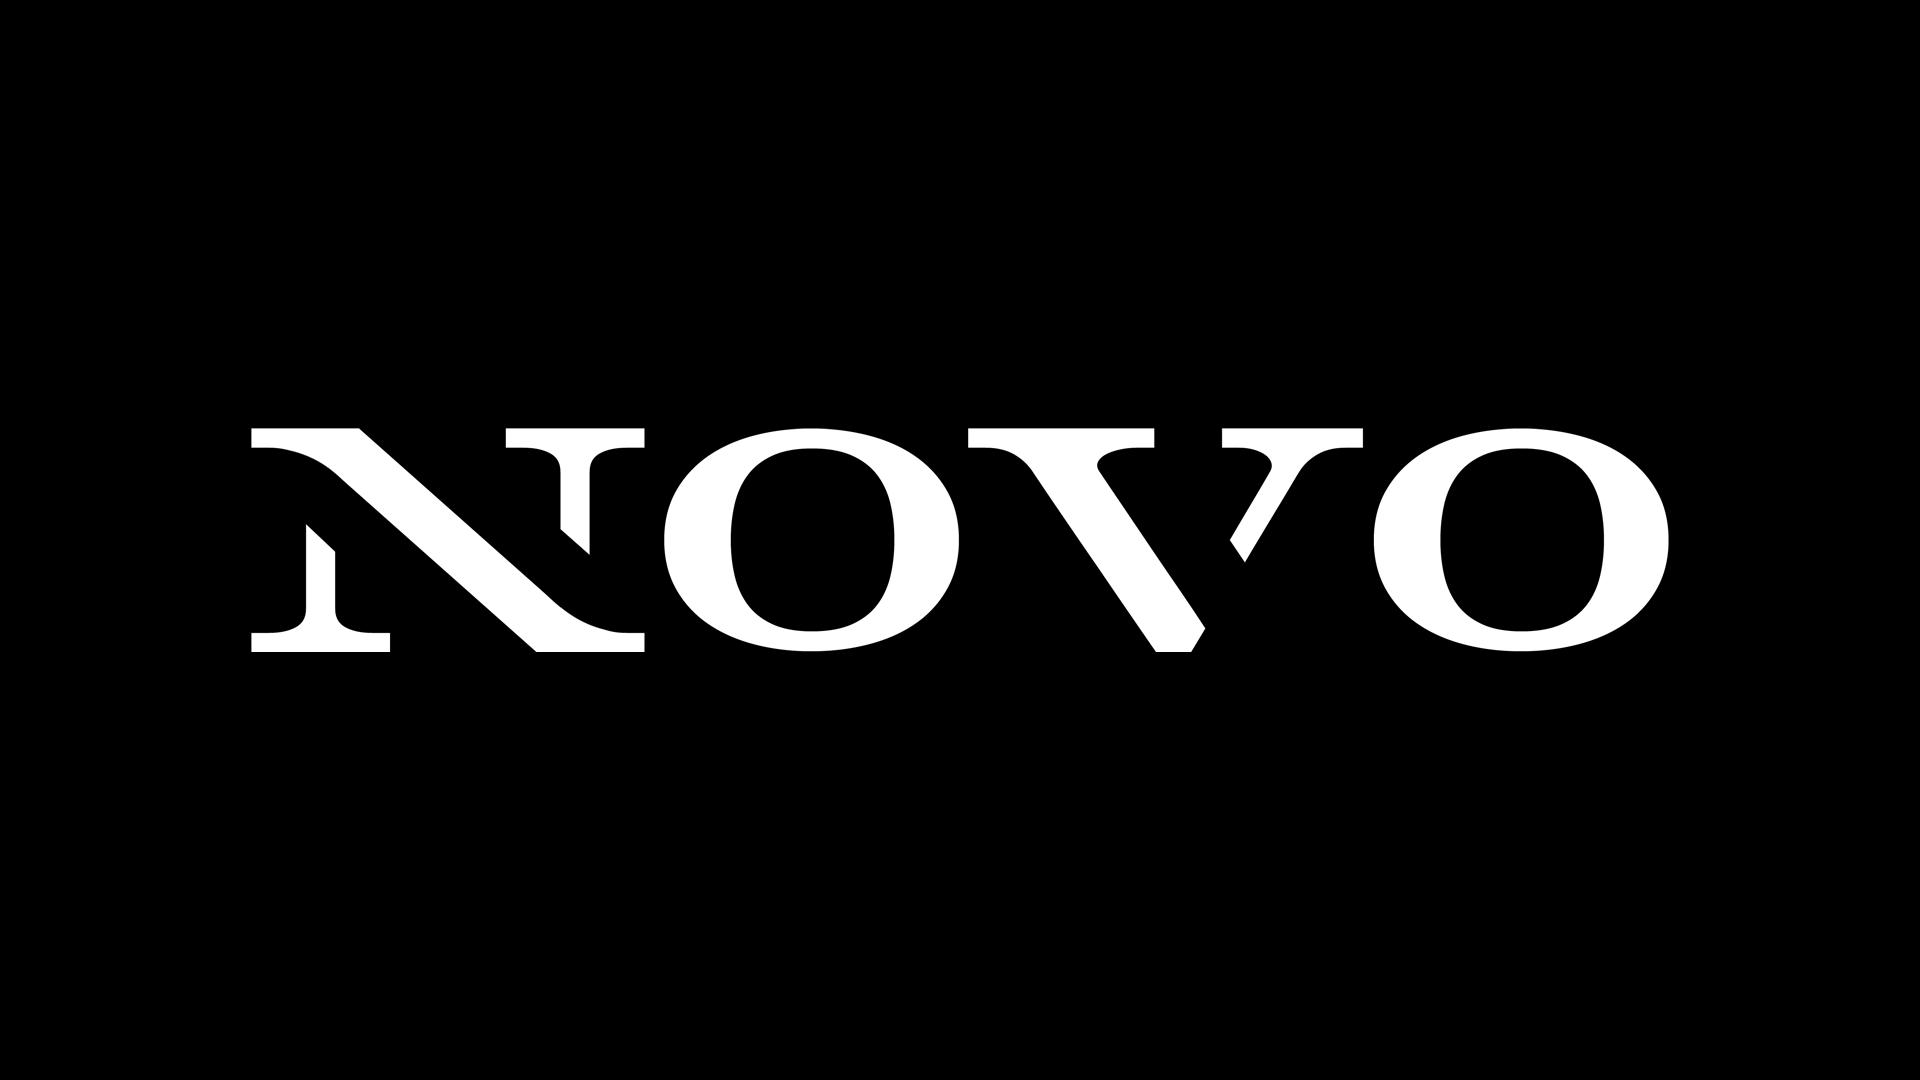 THE NOVO DESIGN [NEW]